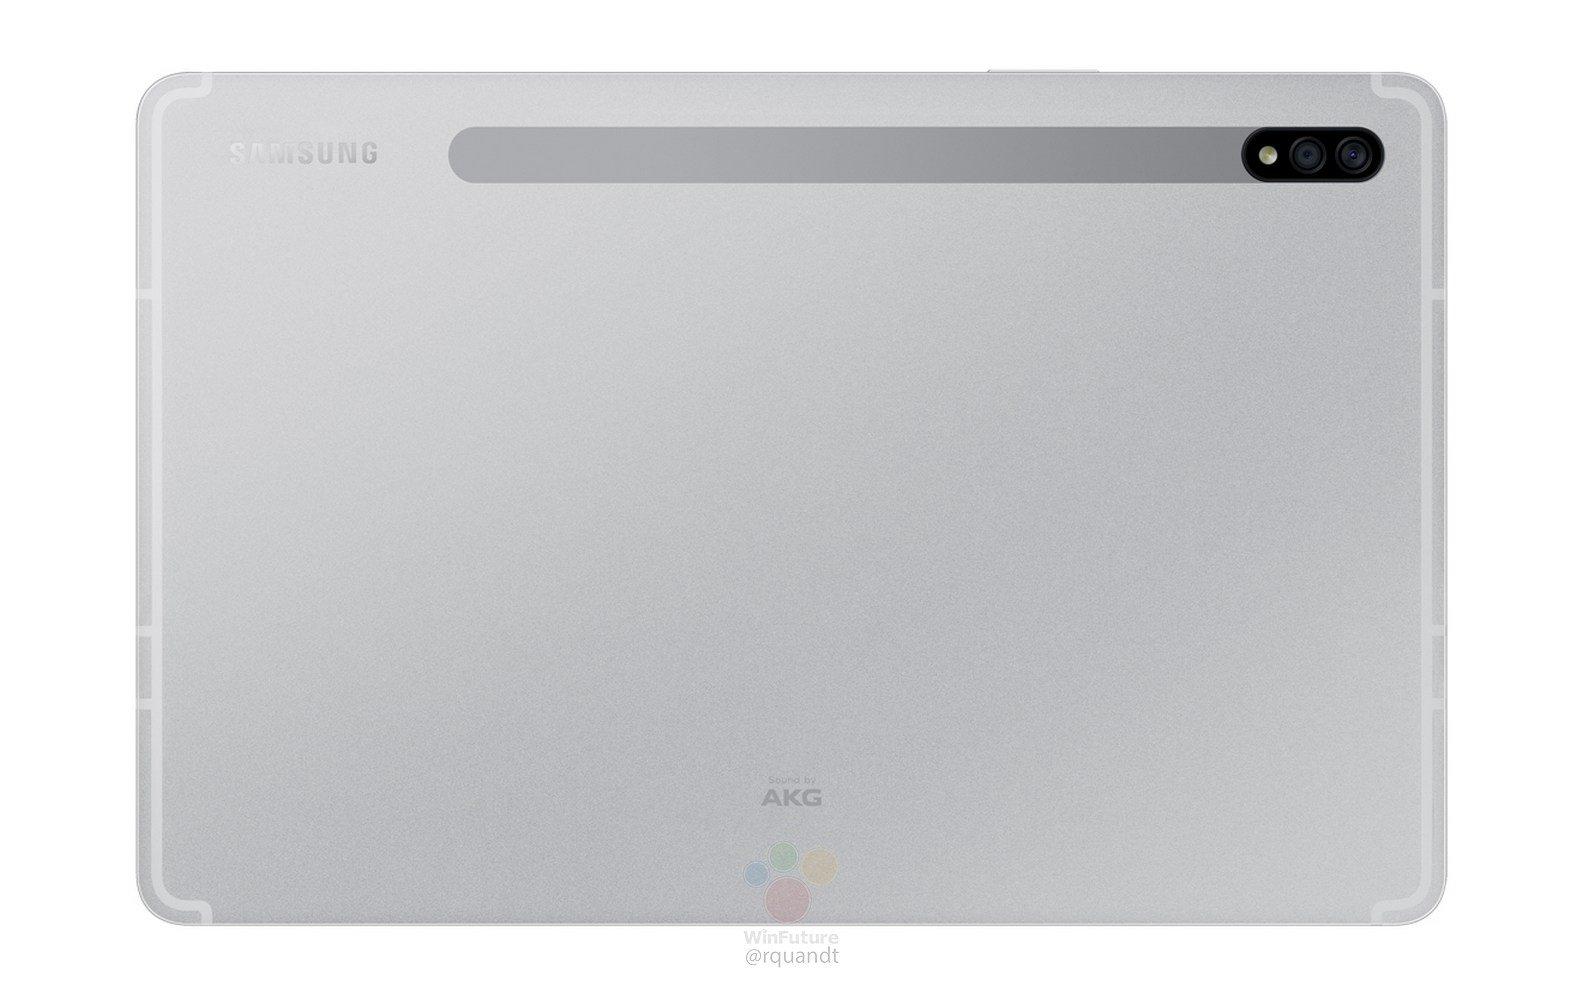 Samsung_Galaxy_Tab_S7_und_S7_Plus_Mega_Leak_2.jpg (1583×998)